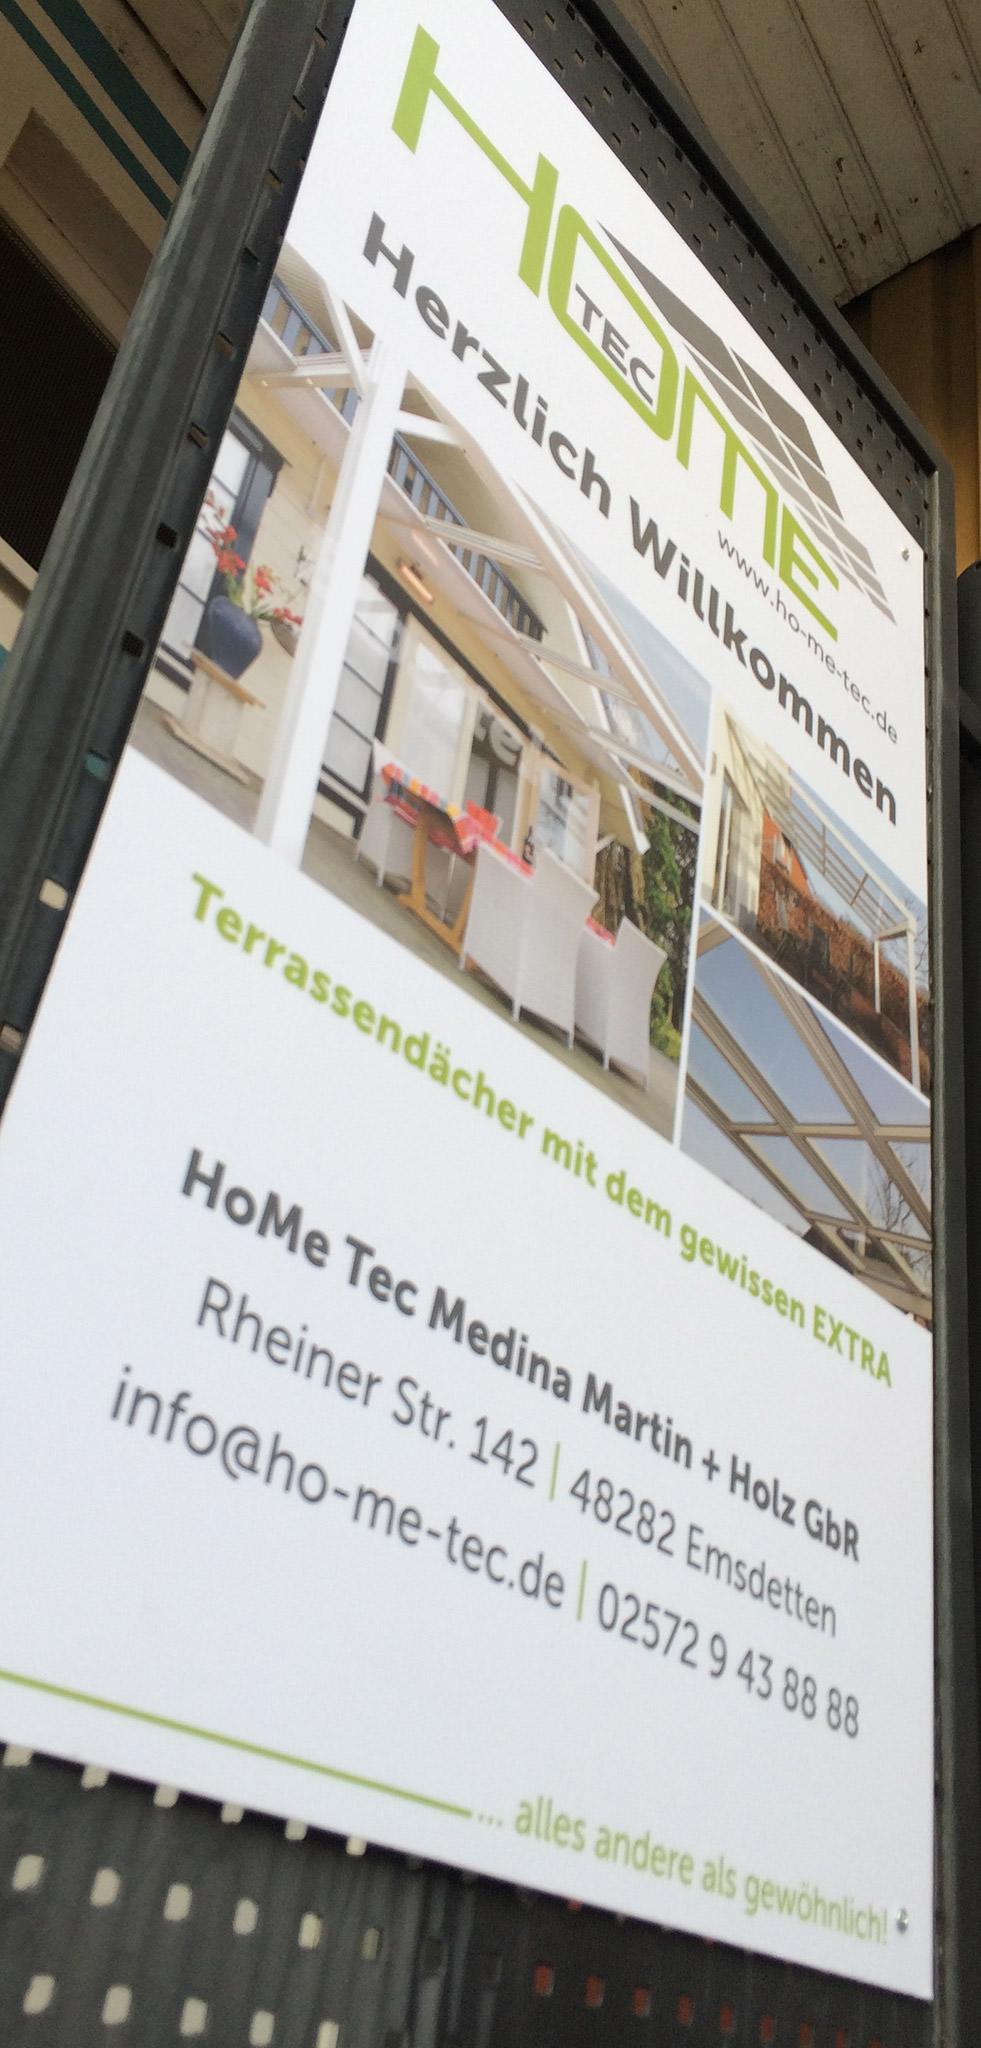 HoMeTec Ausstellung